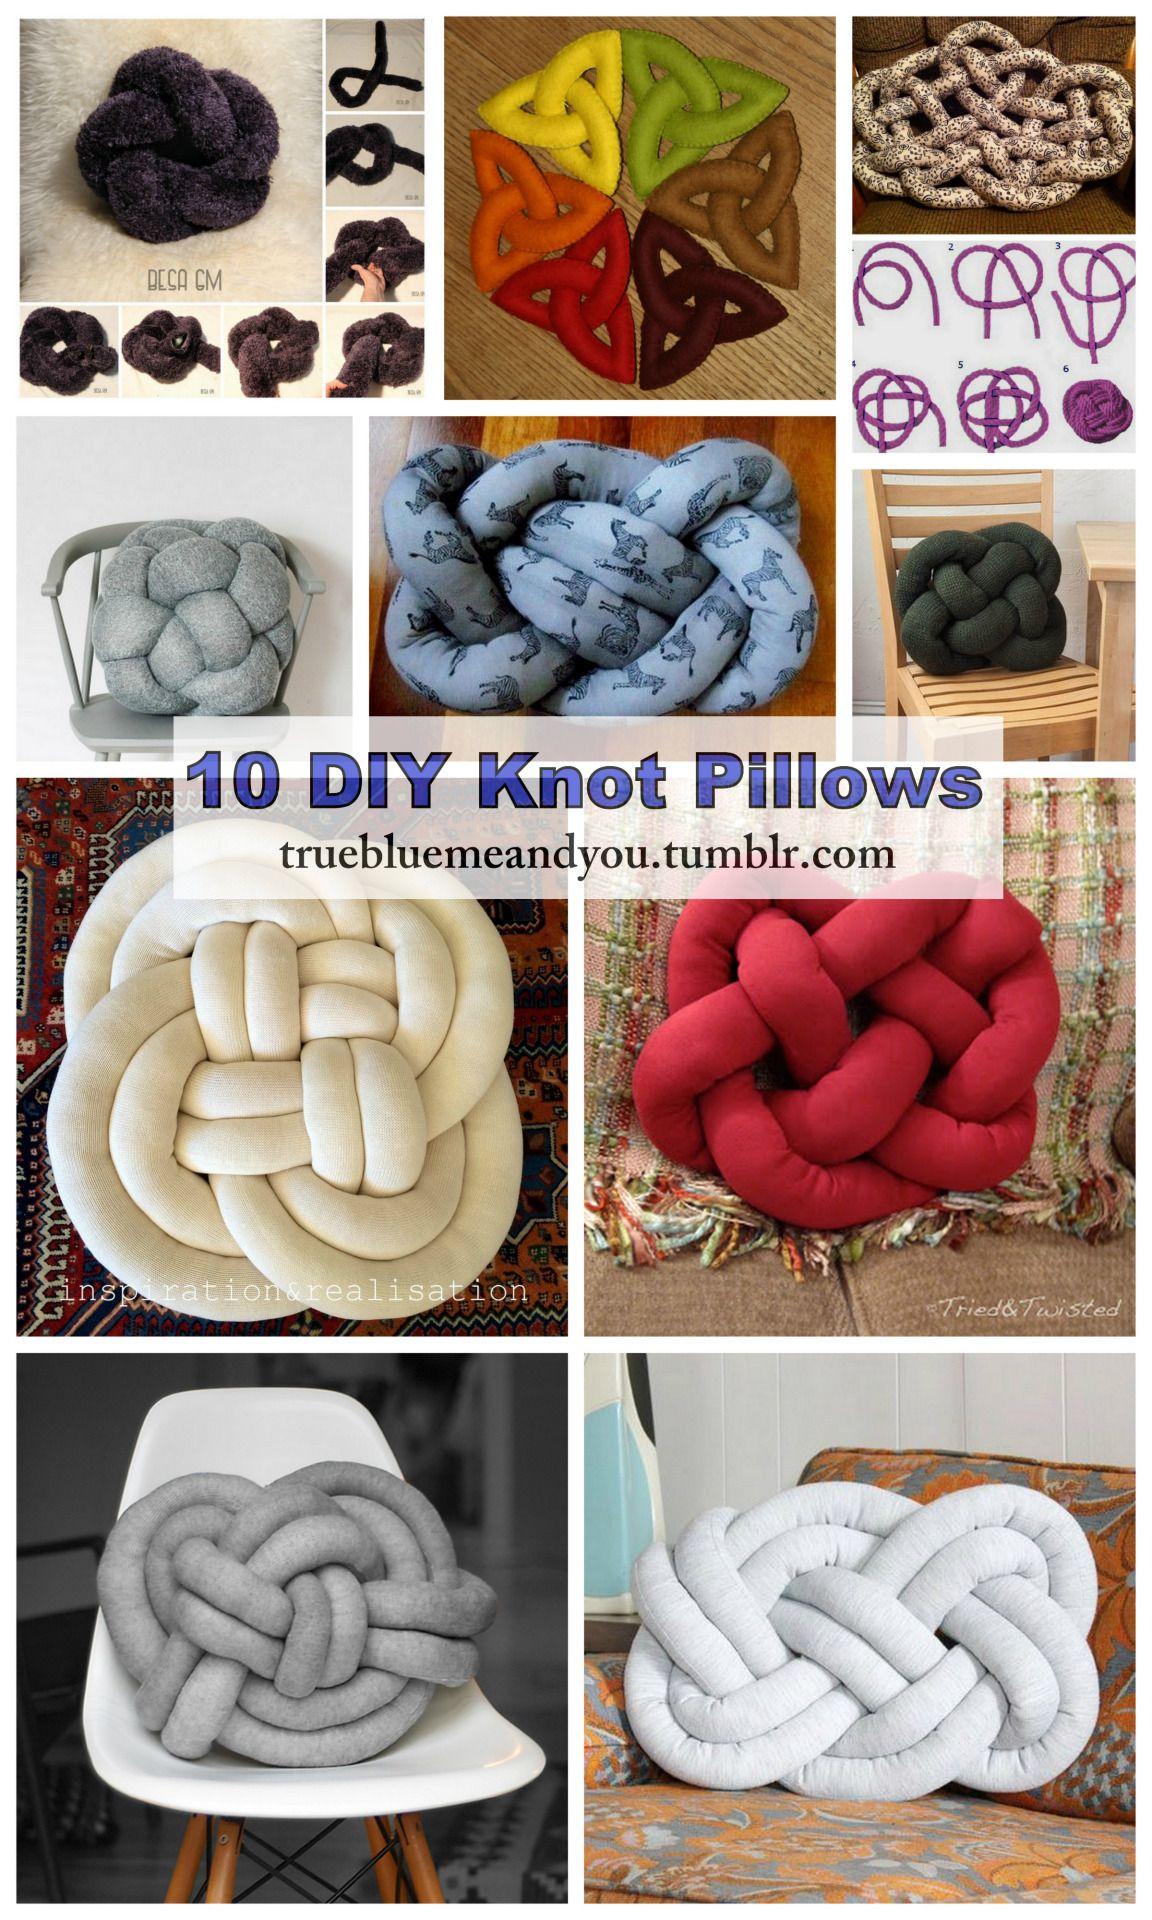 diy knot pillows roundup by truebluemeandyou a blogging friend